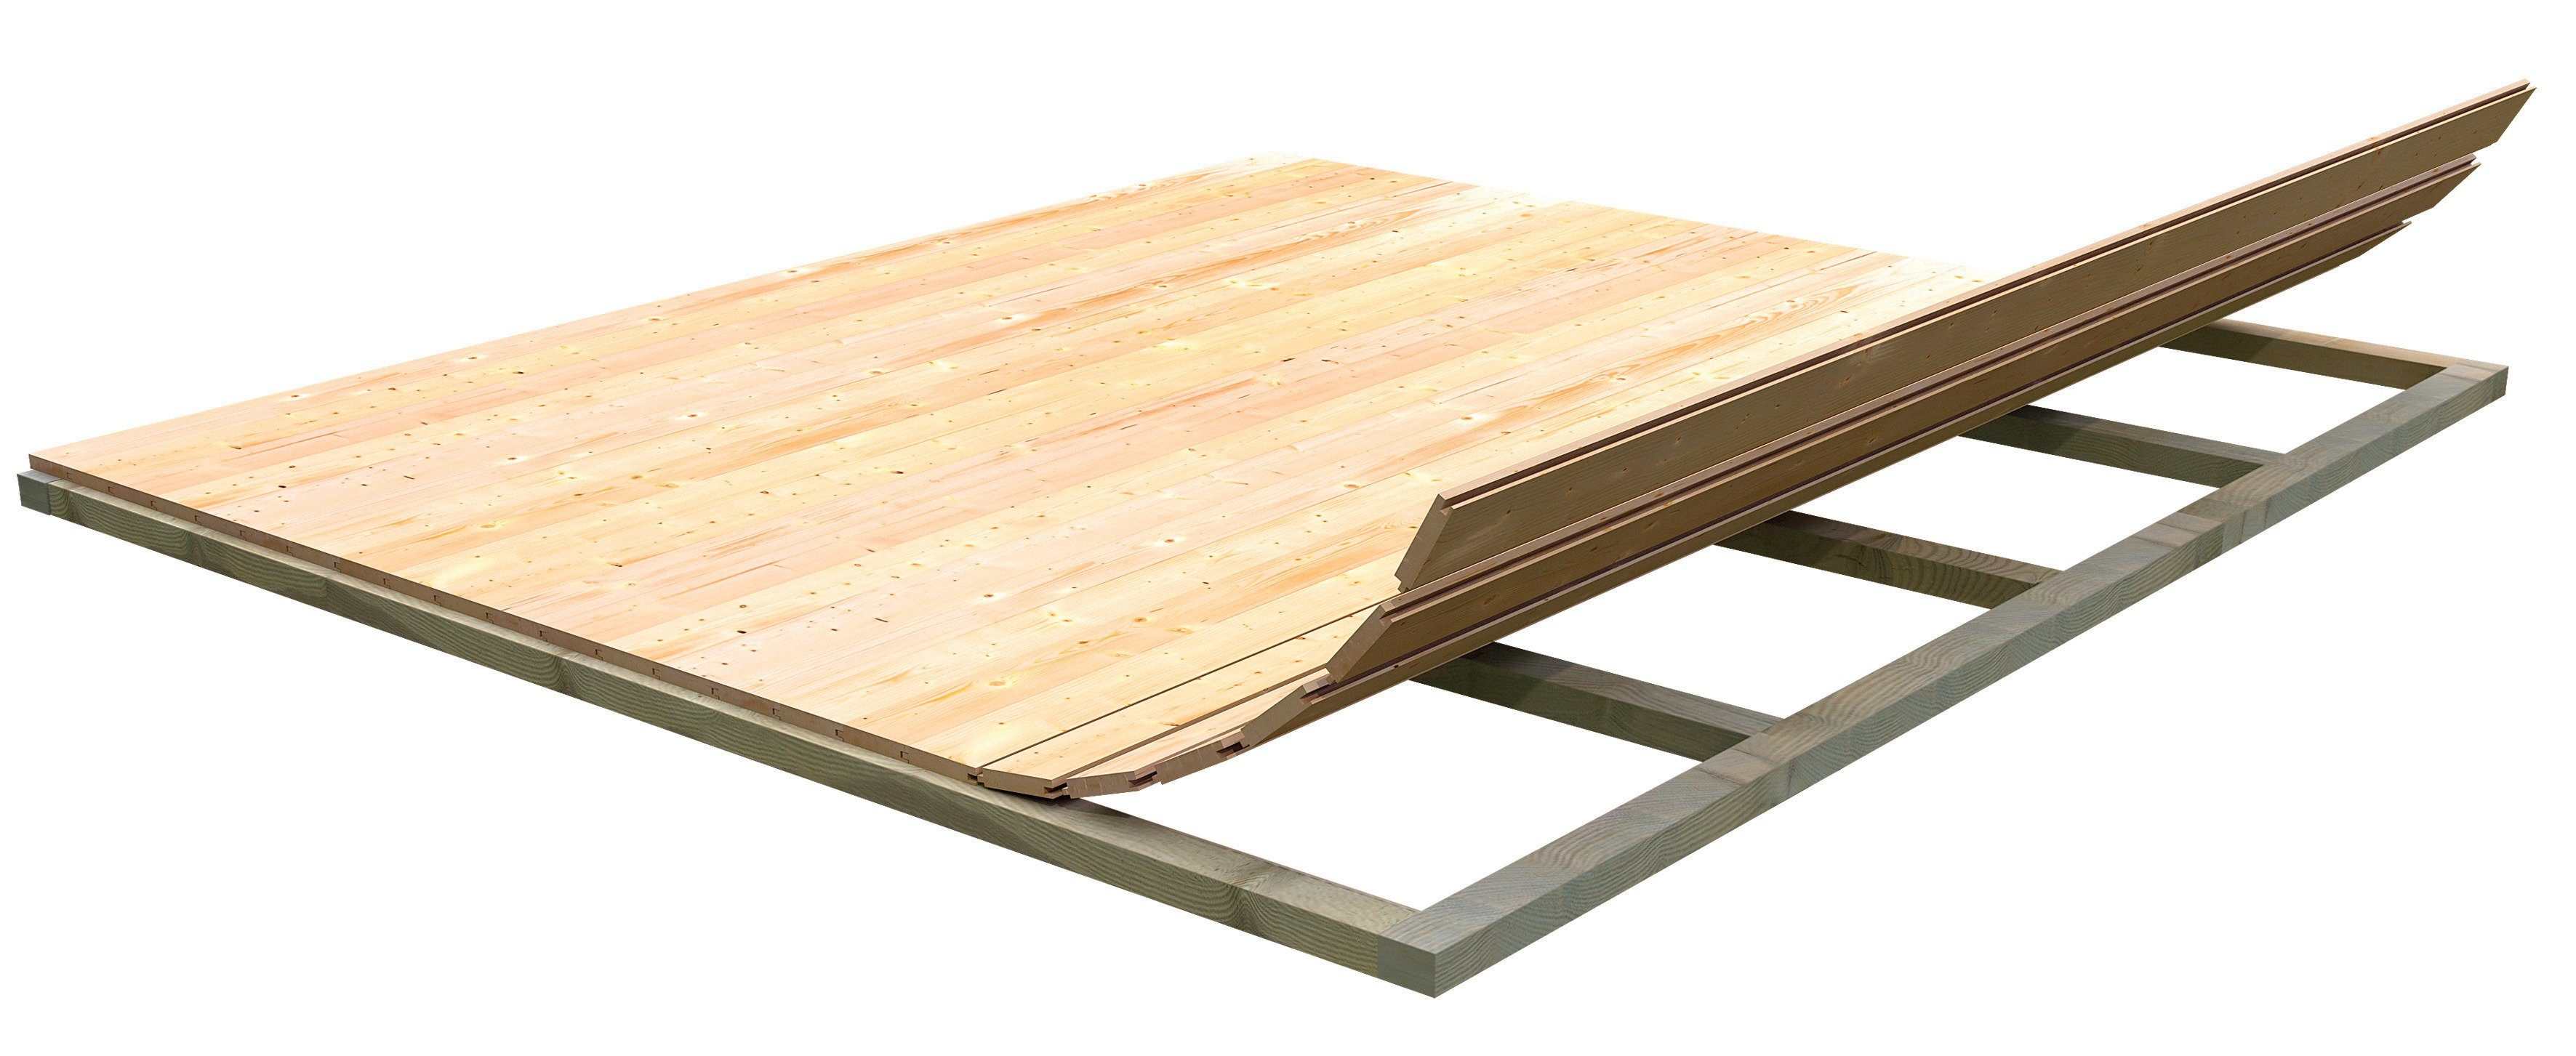 KARIBU Fußboden für Gartenhäuser , BxT: 230x230 cm